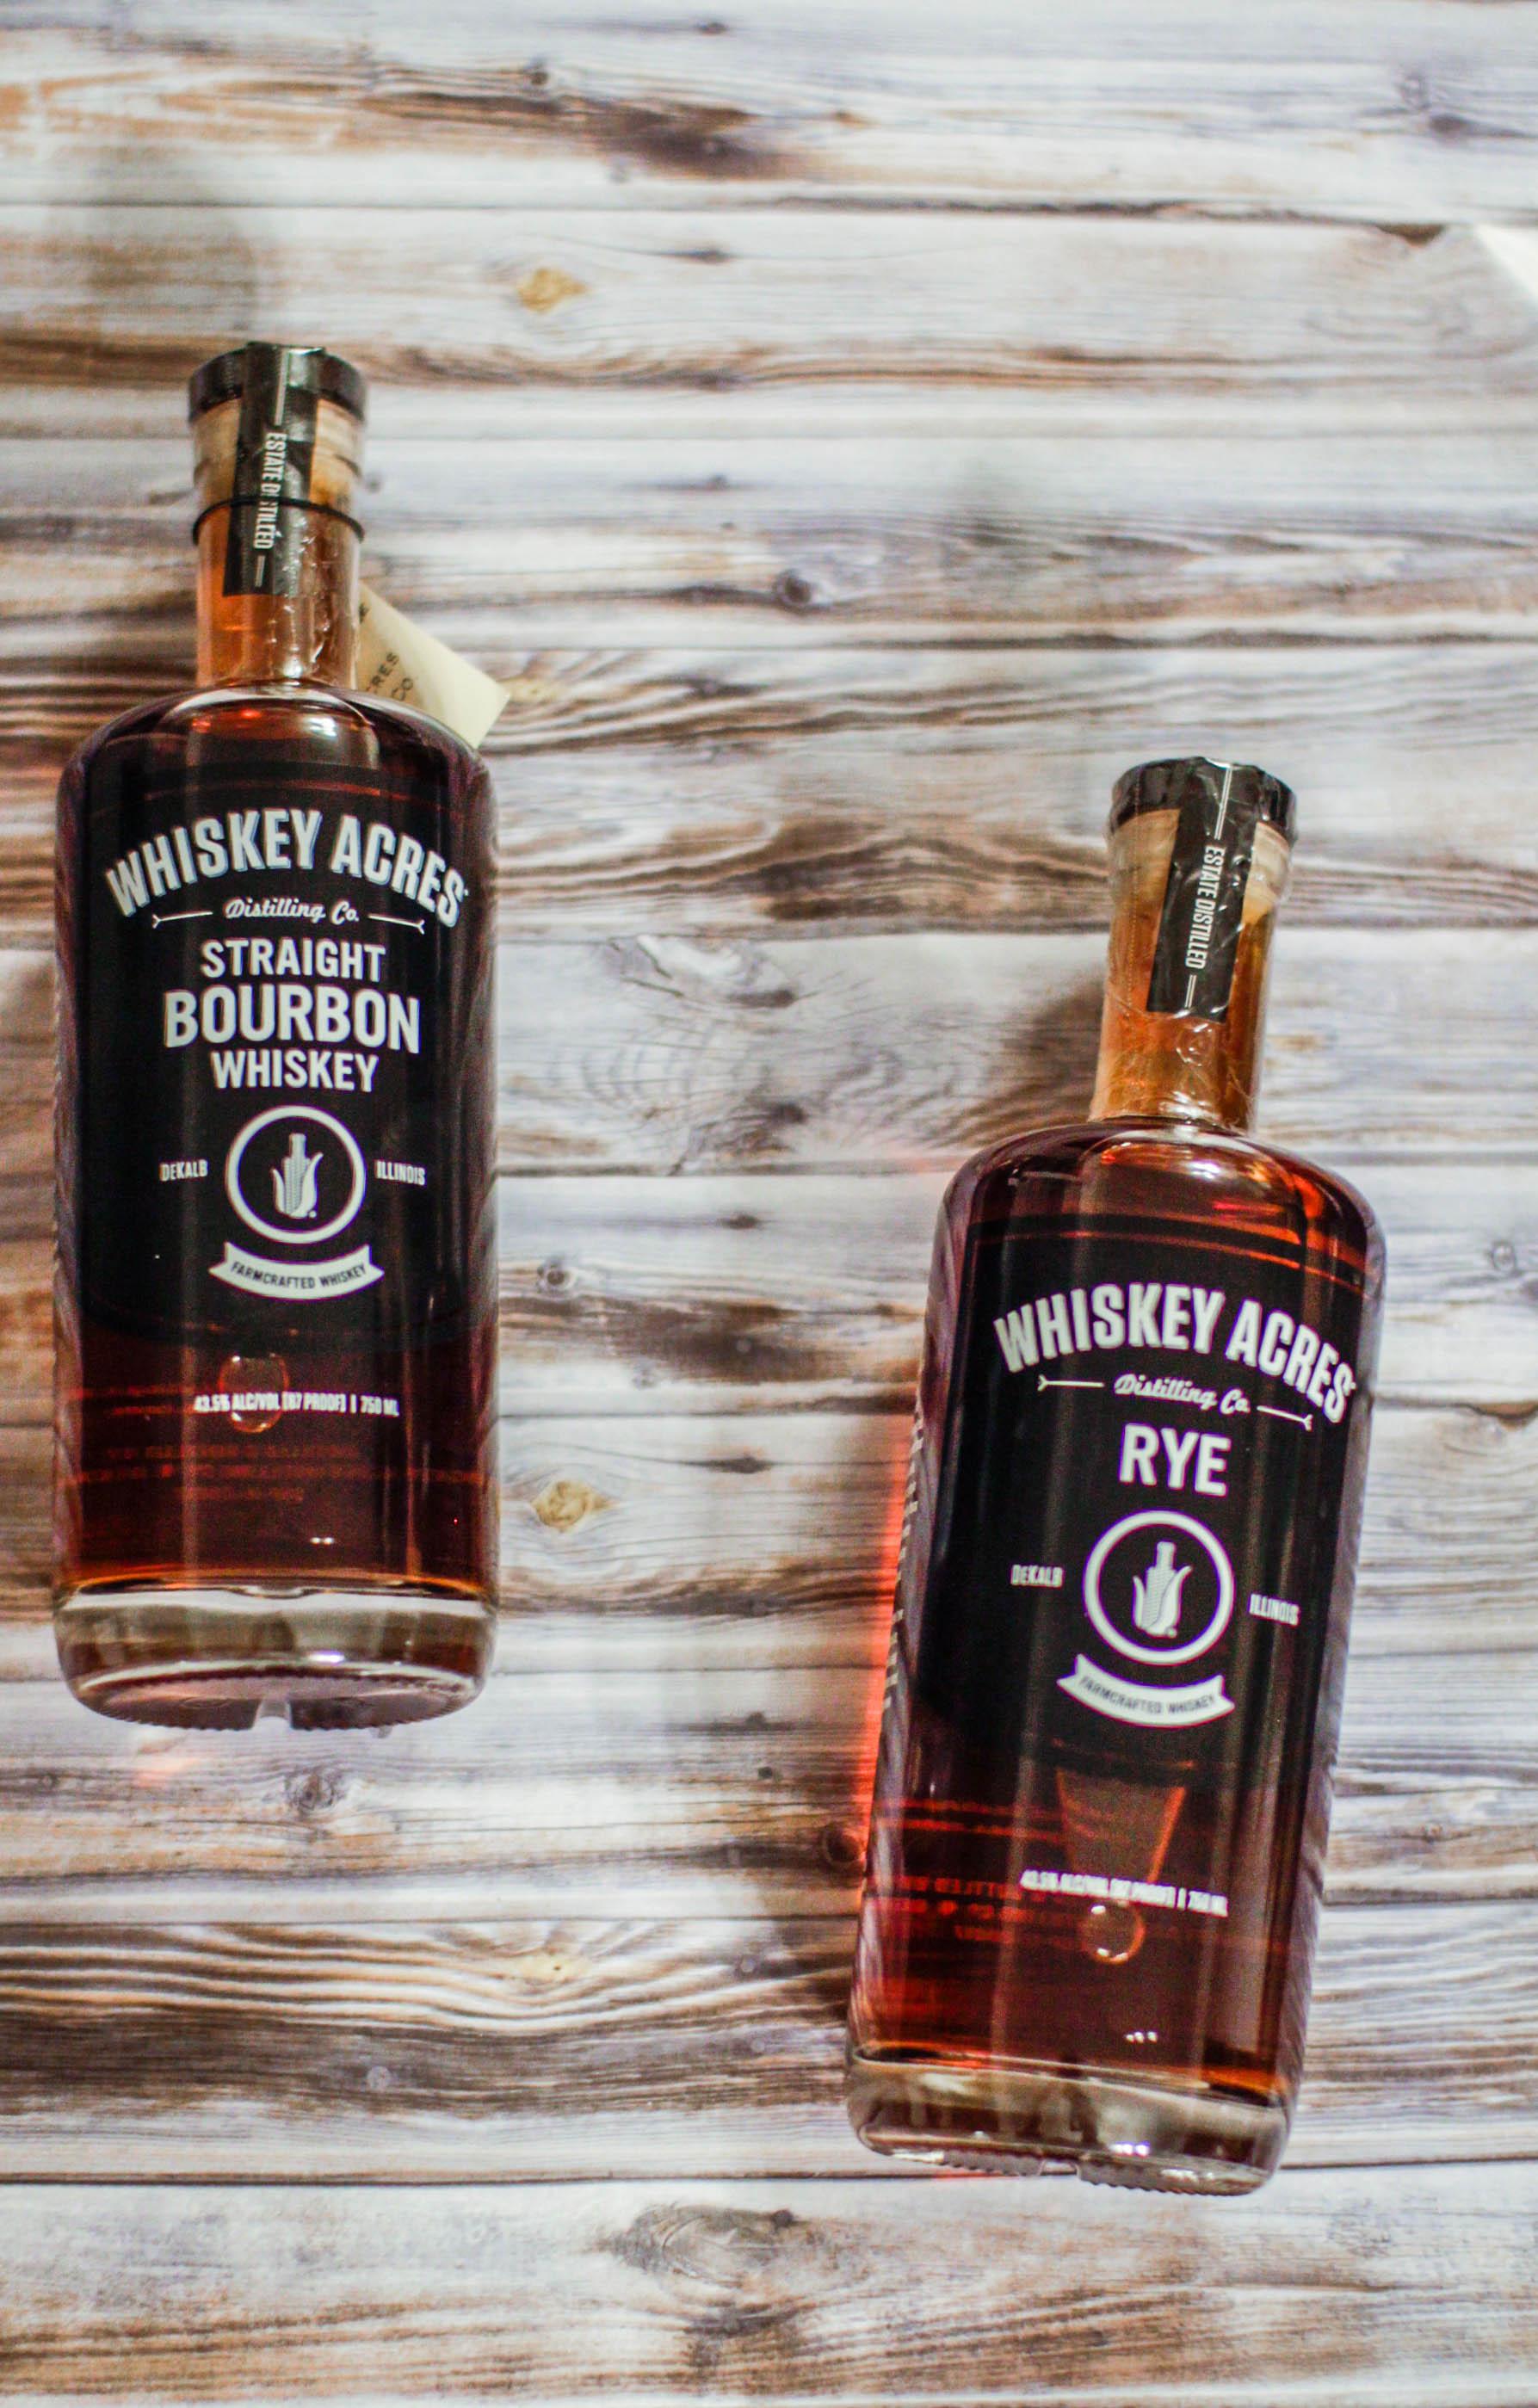 Whiskey Acres Chicago Whiskey